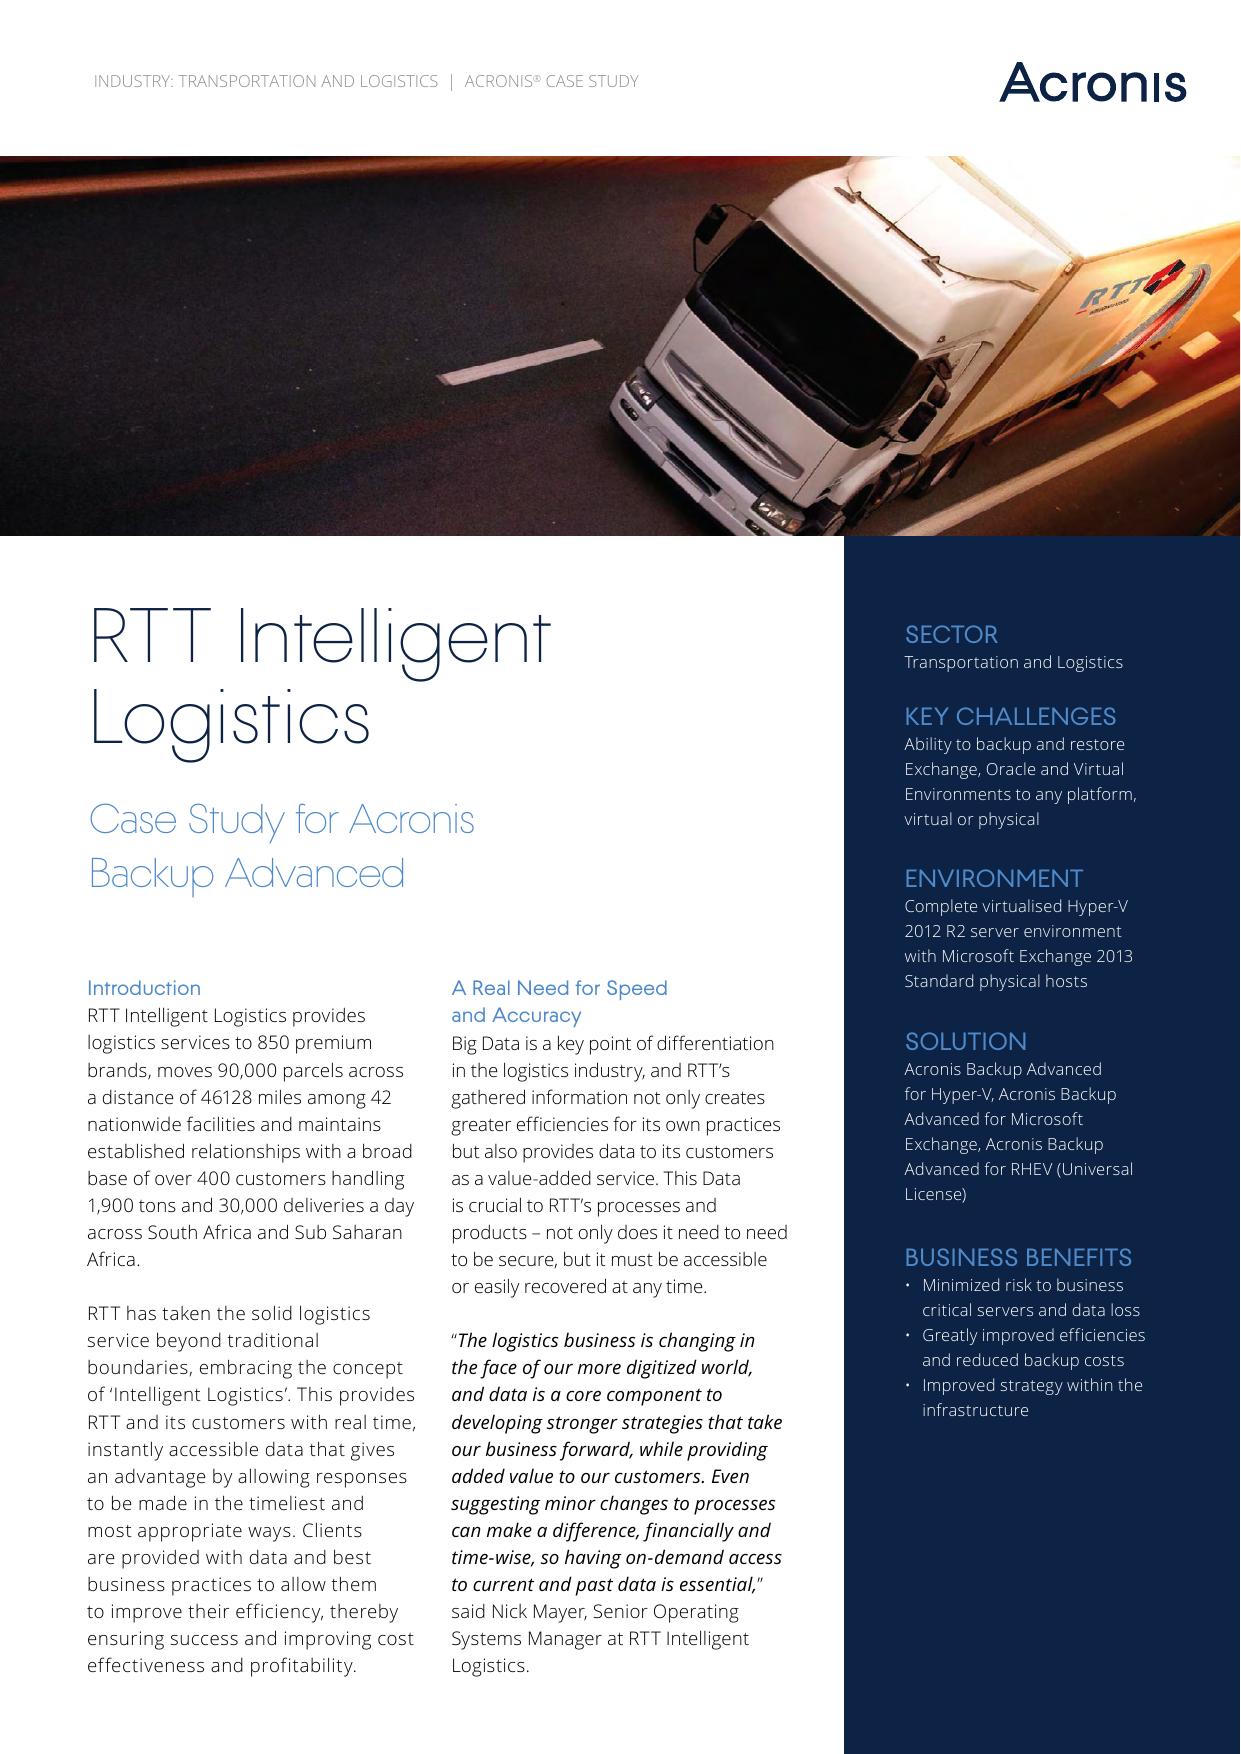 RTT Intelligent Logistics Case Study for Acronis | manualzz com